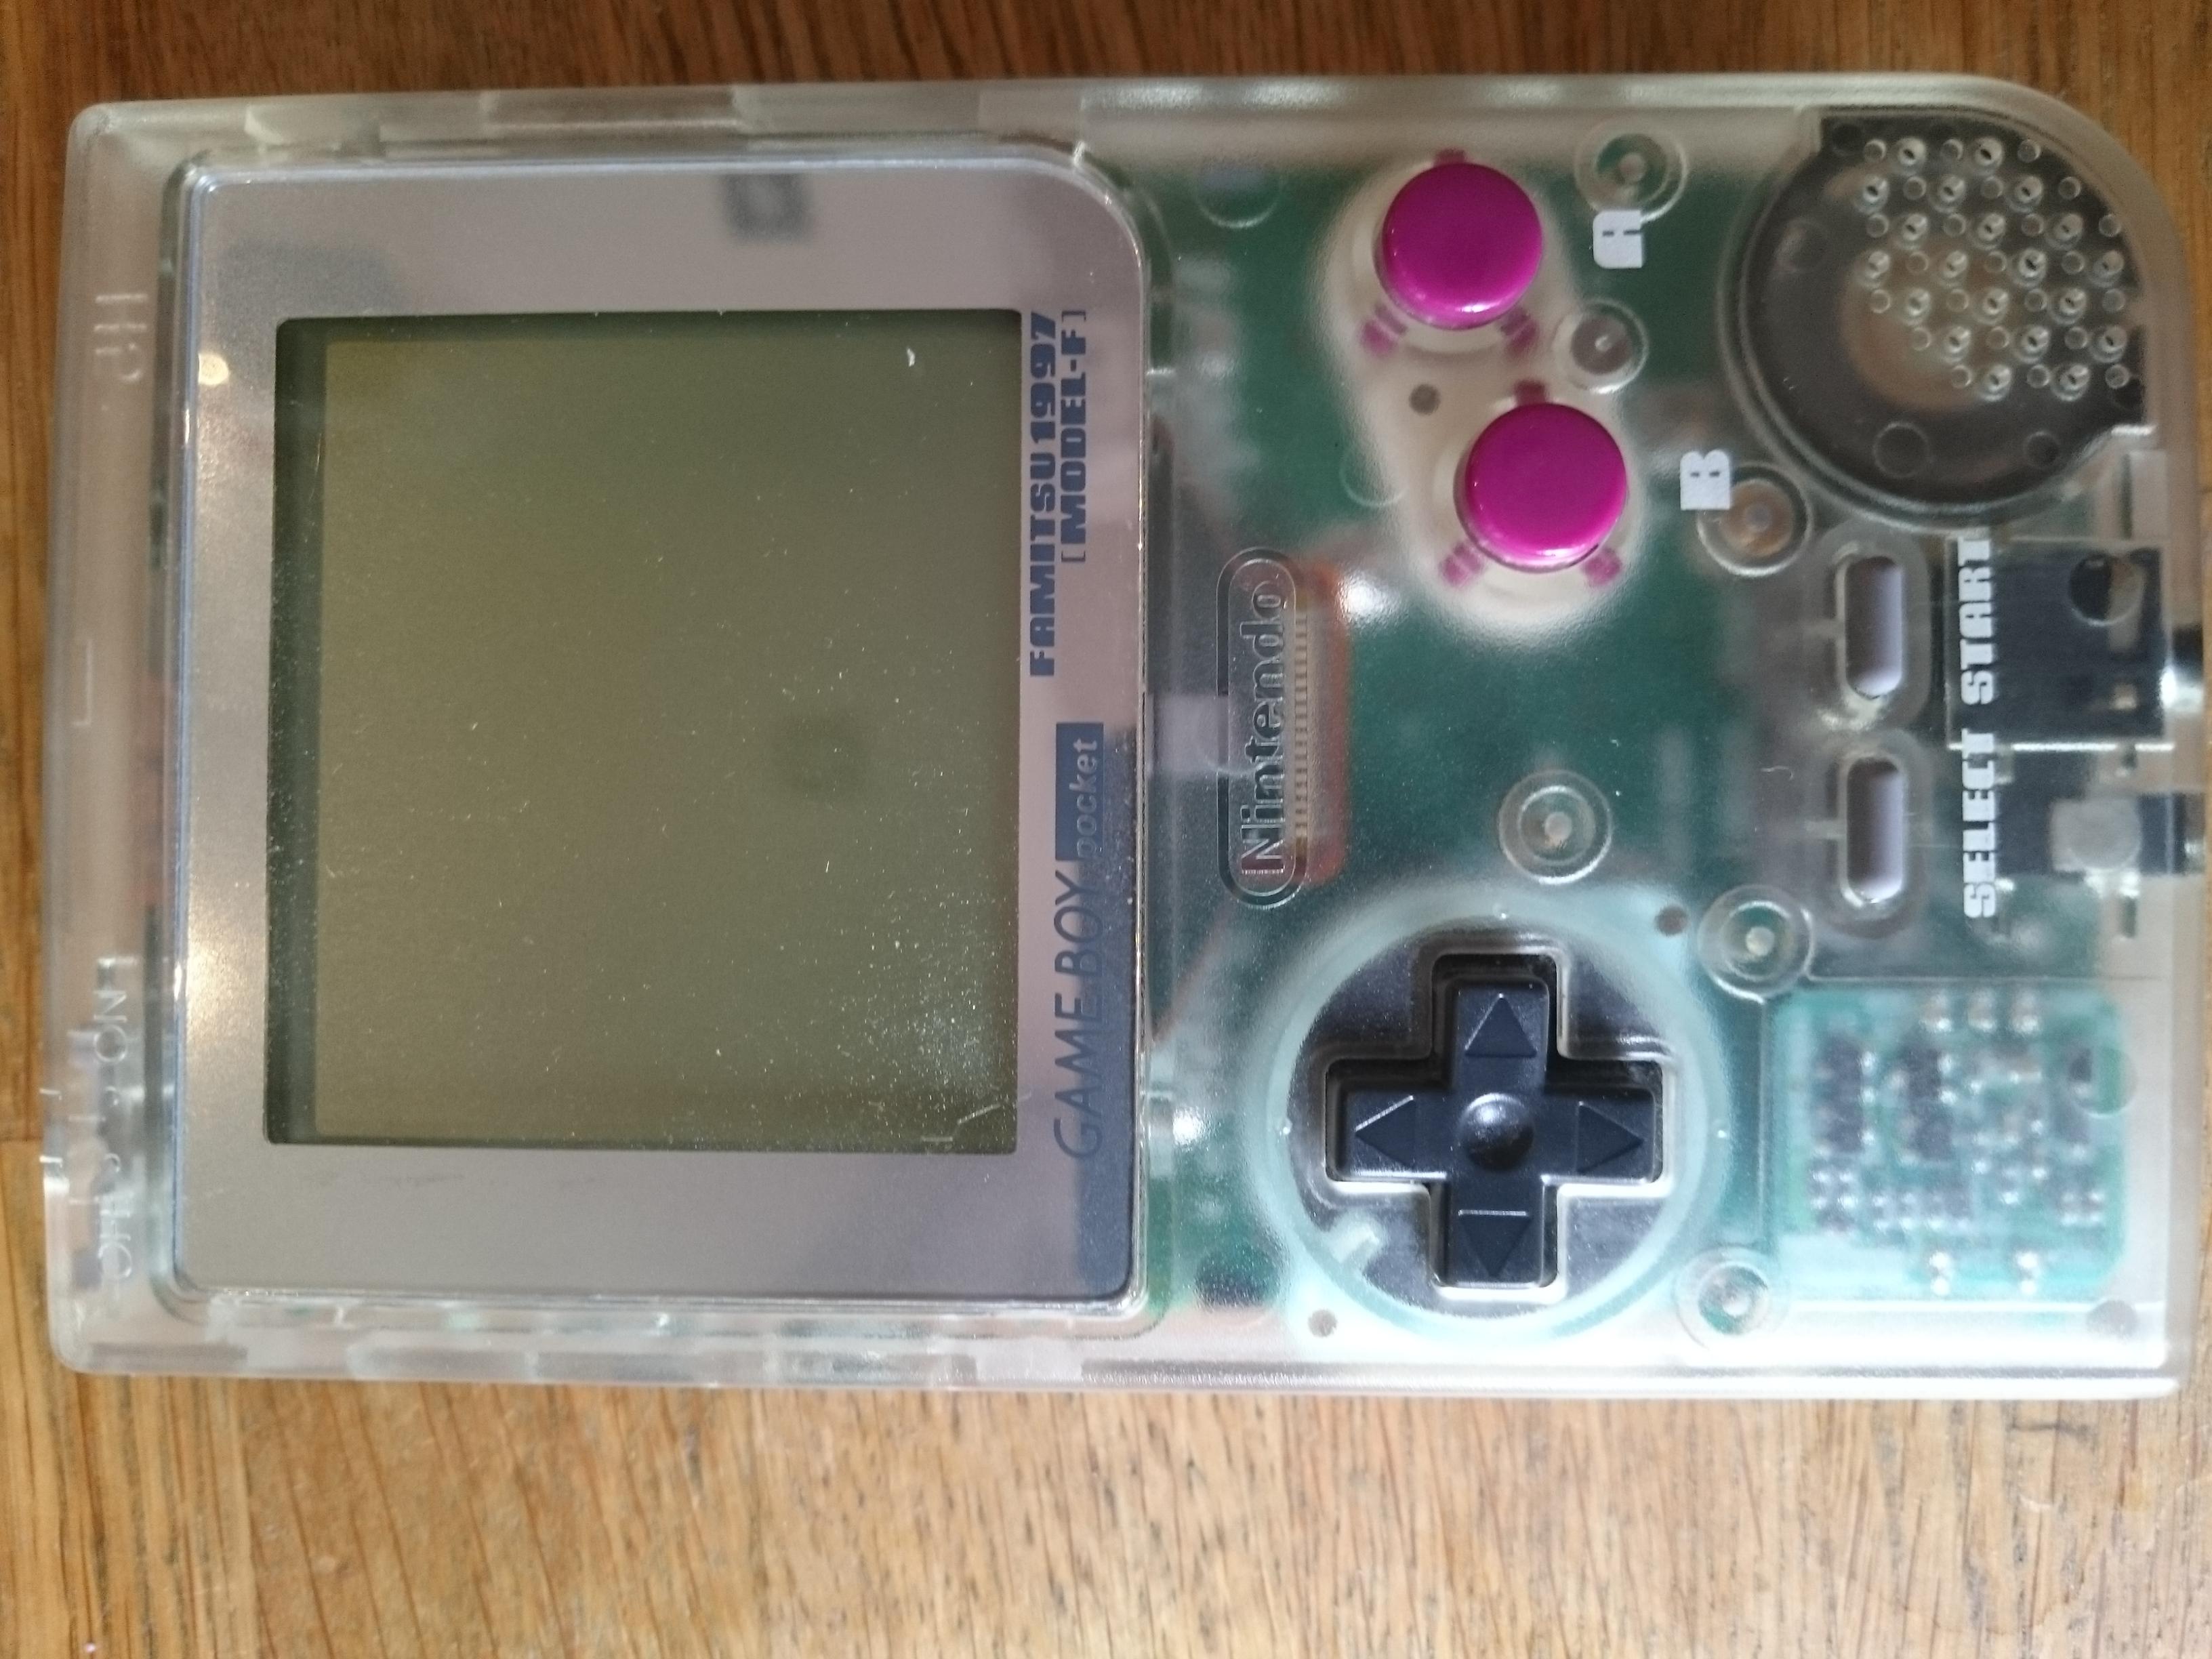 File:Gameboy Pocket Model F Famitsu edition 1997 jpg - Wikimedia Commons